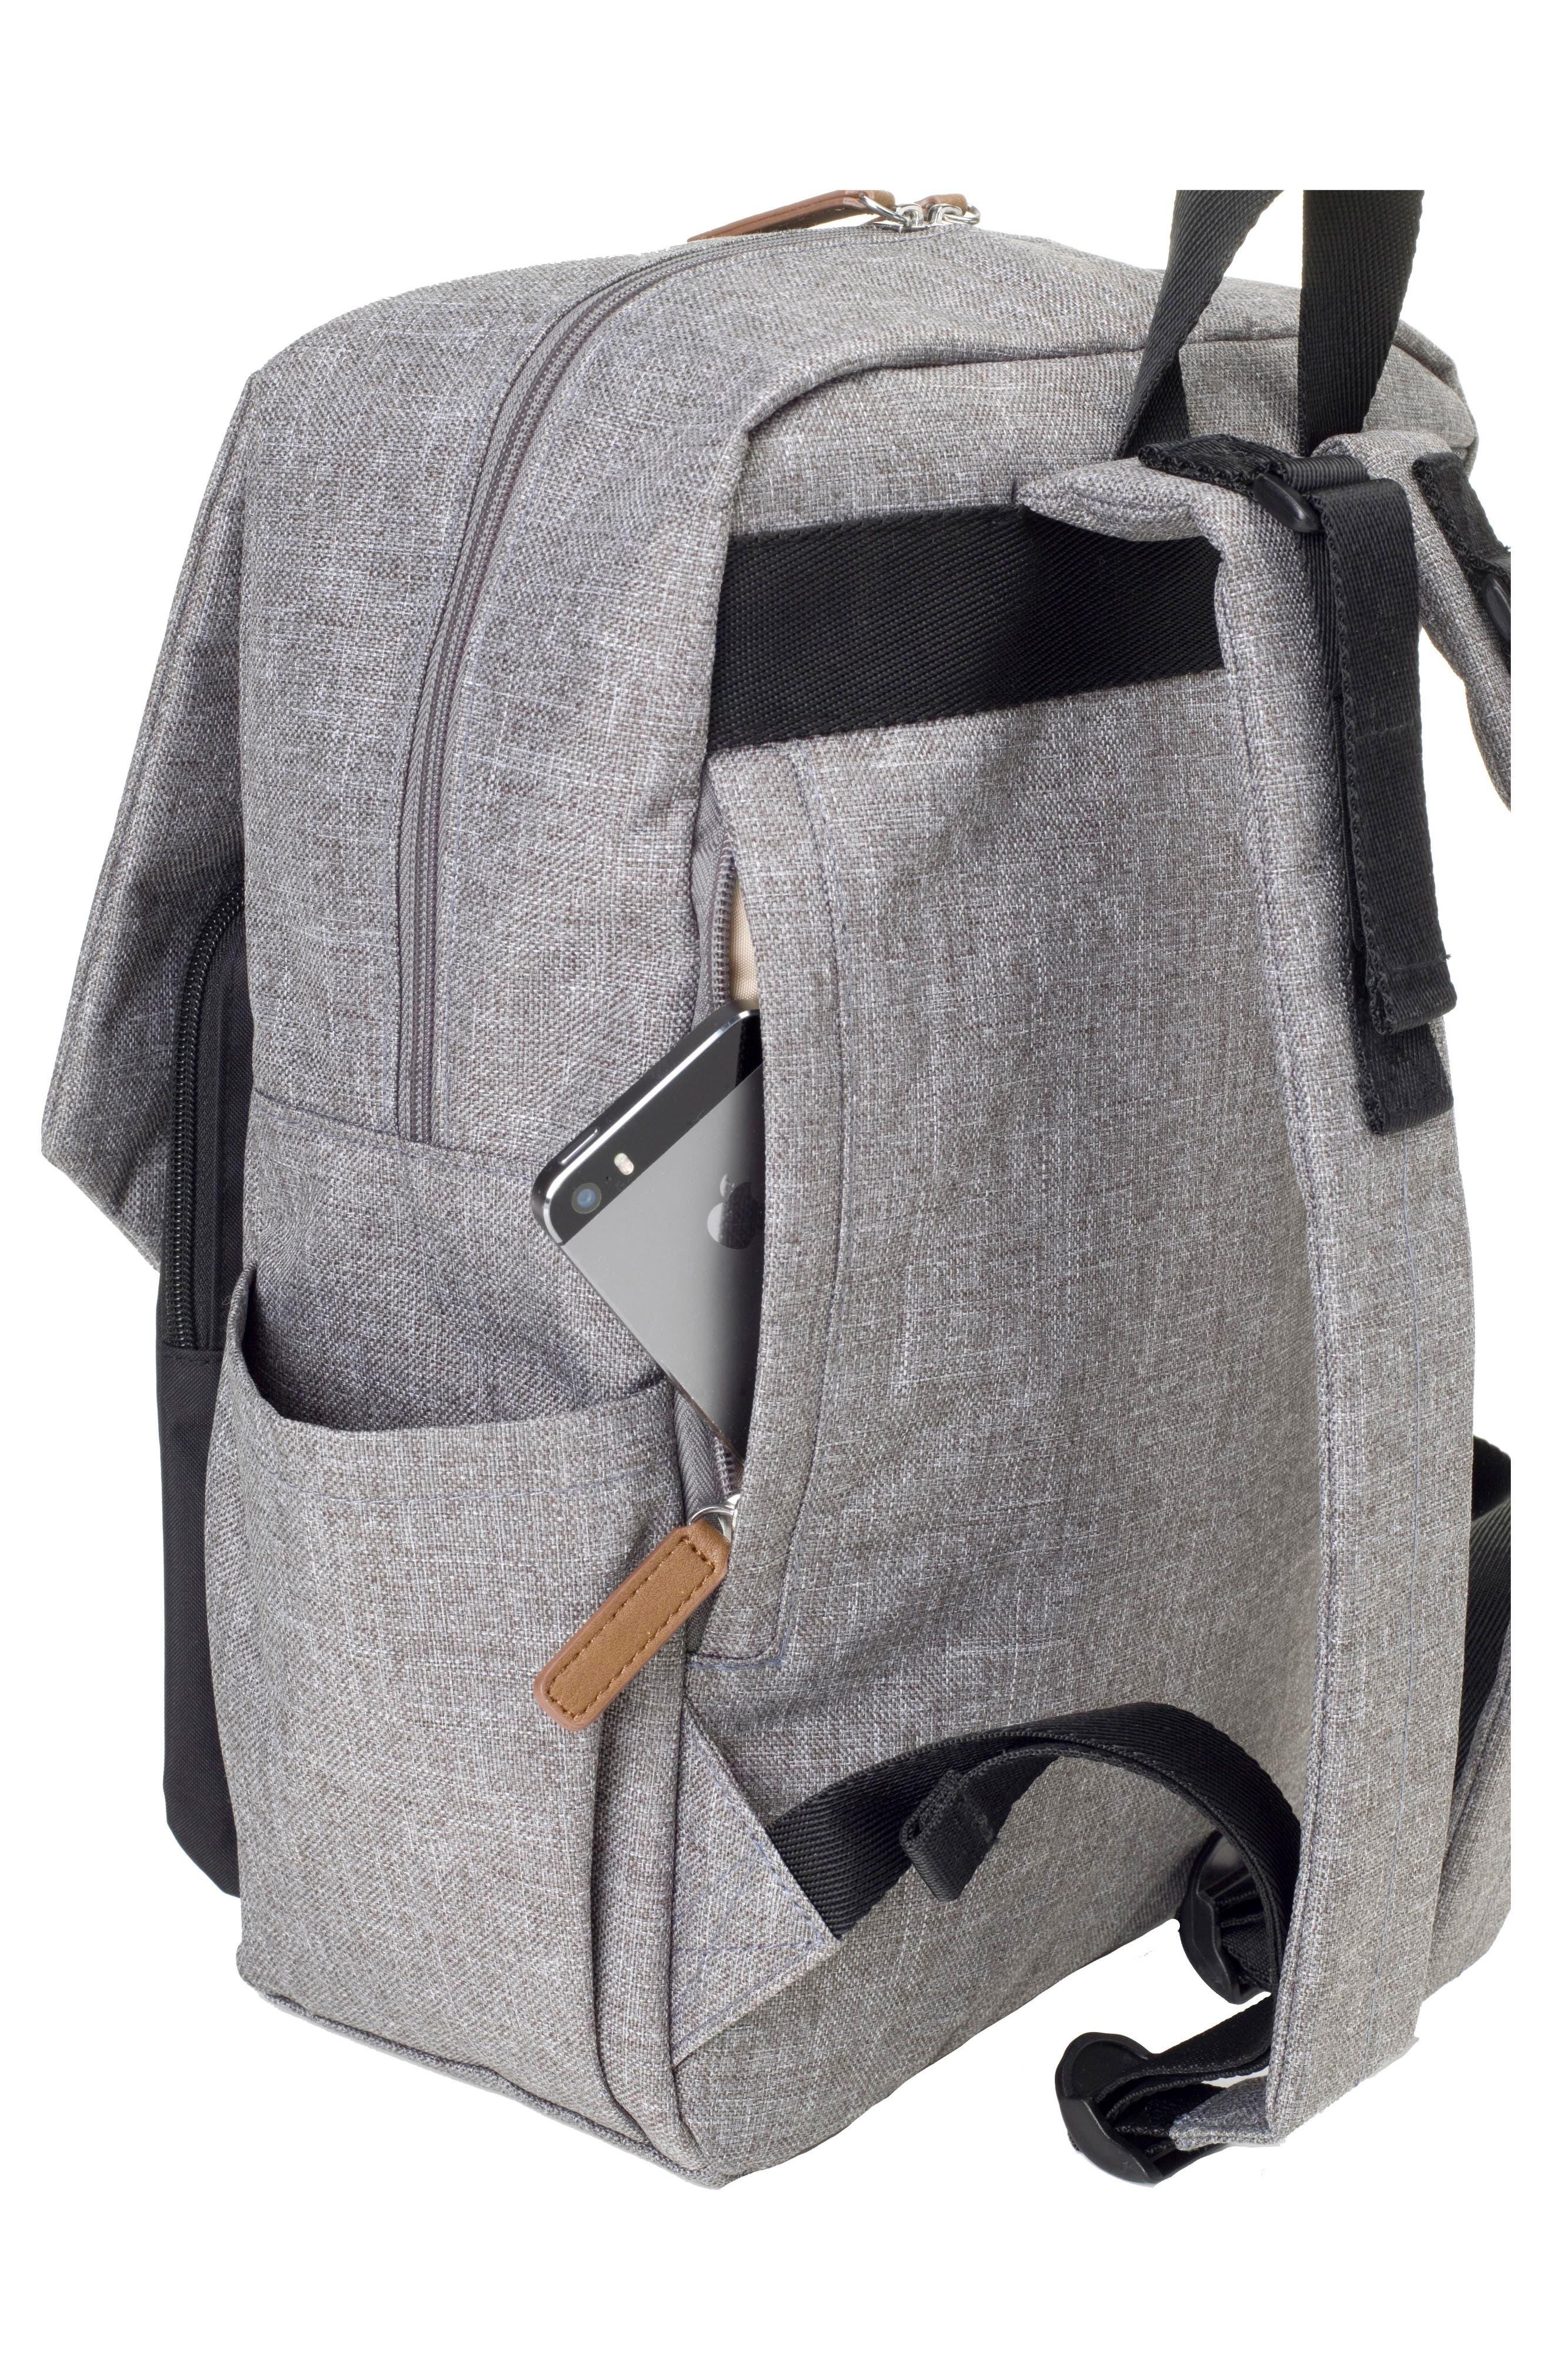 George Water Resistant Diaper Backpack,                             Alternate thumbnail 4, color,                             BLACK/ GREY